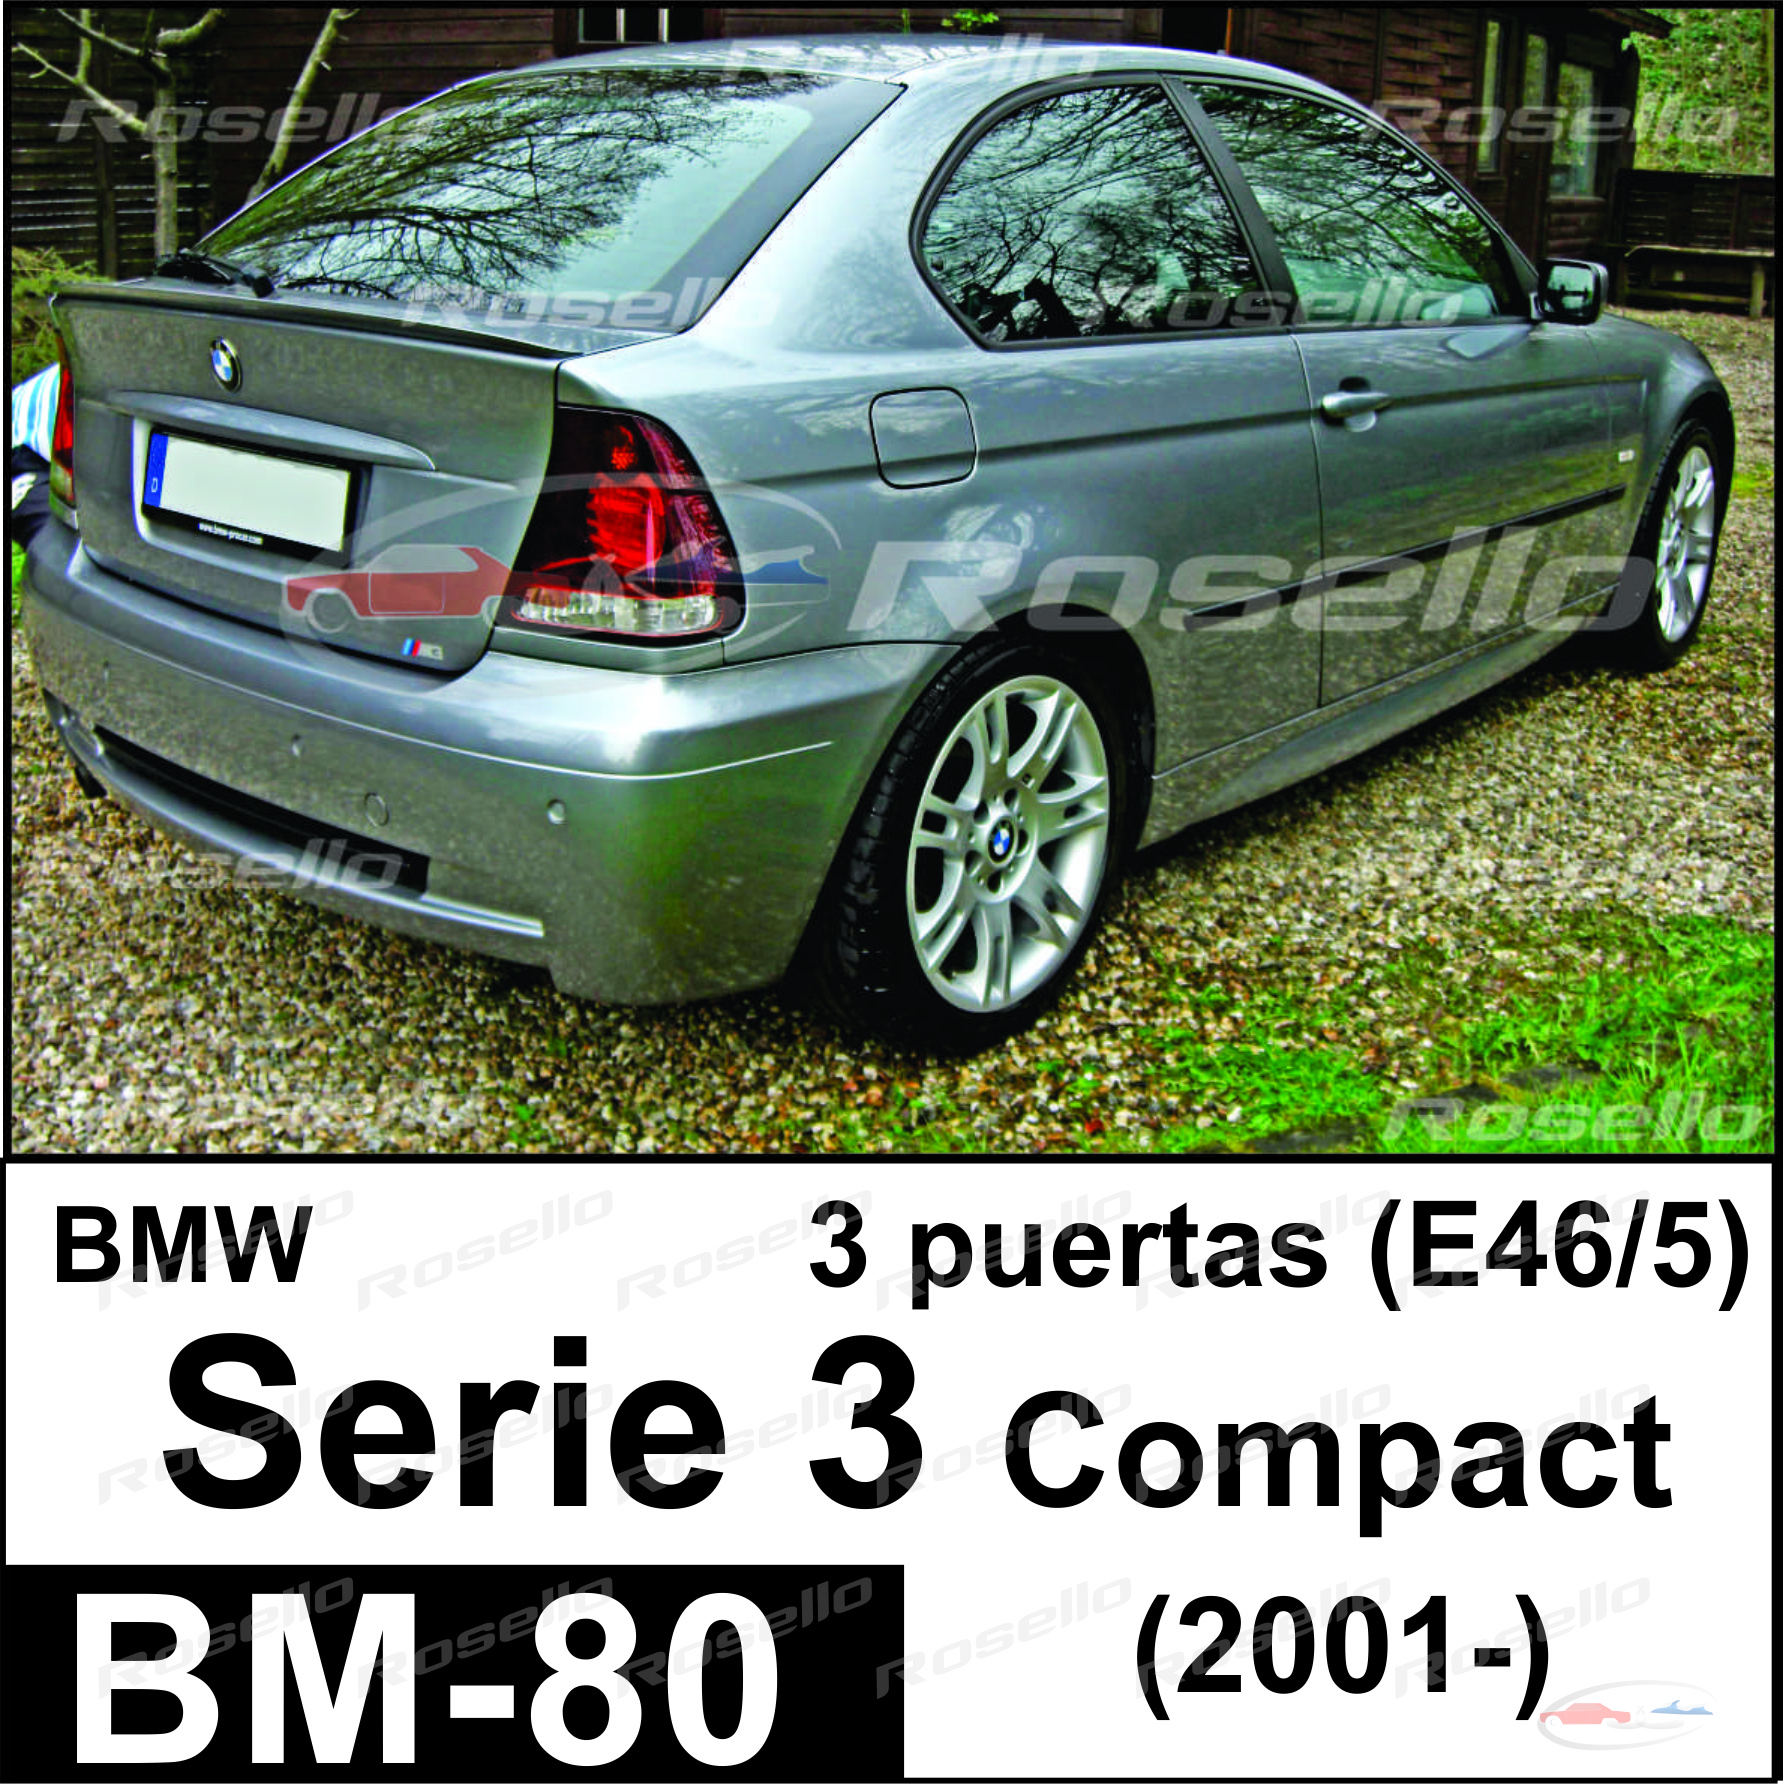 BM-080